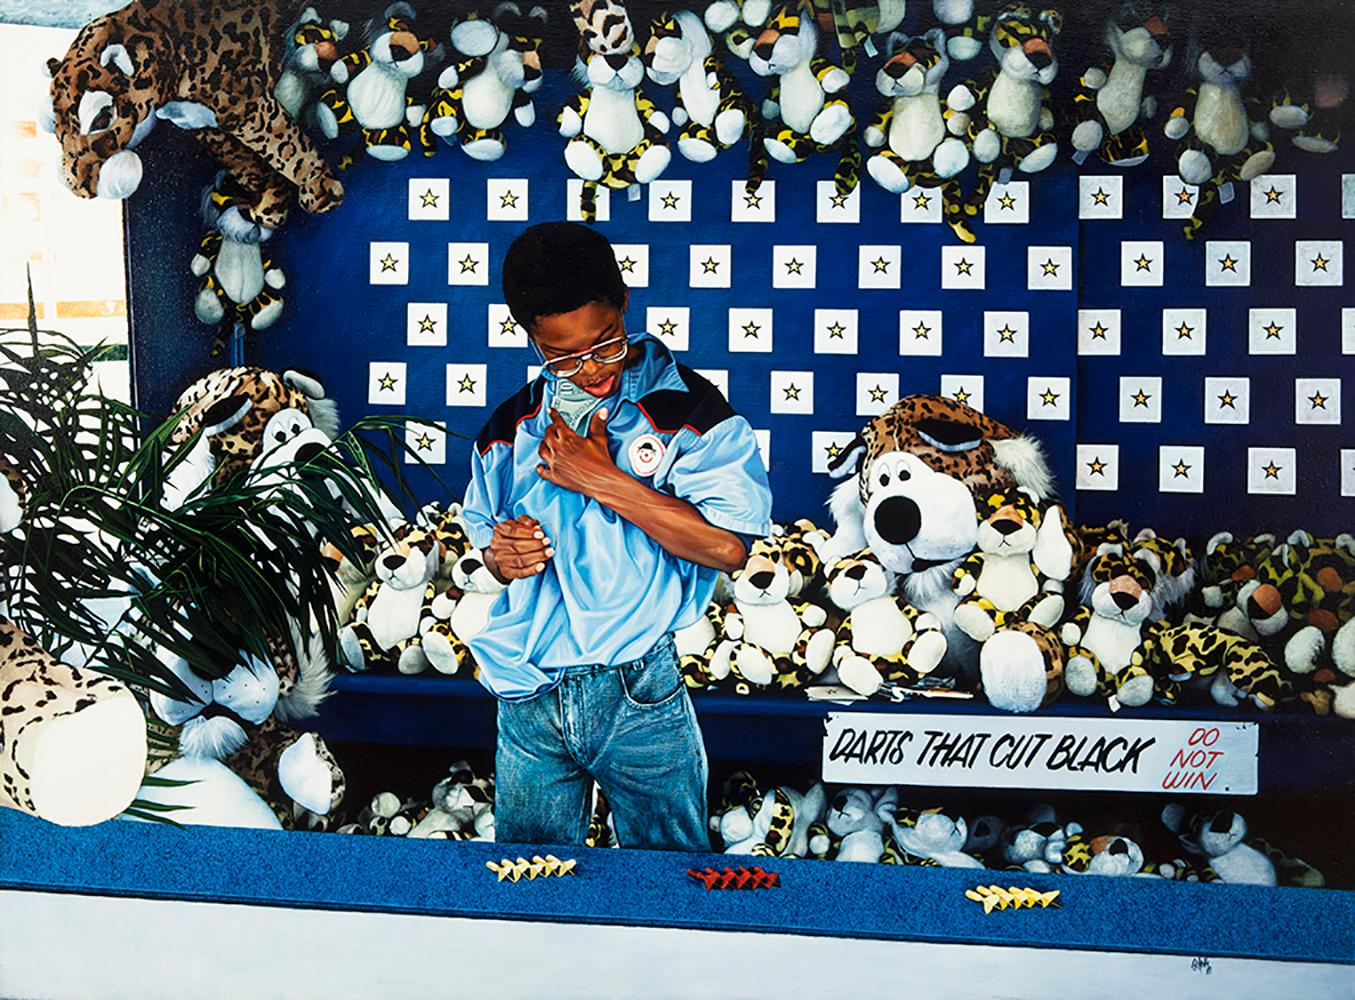 Barry Ortesky, Darts That Cut Black, 1989